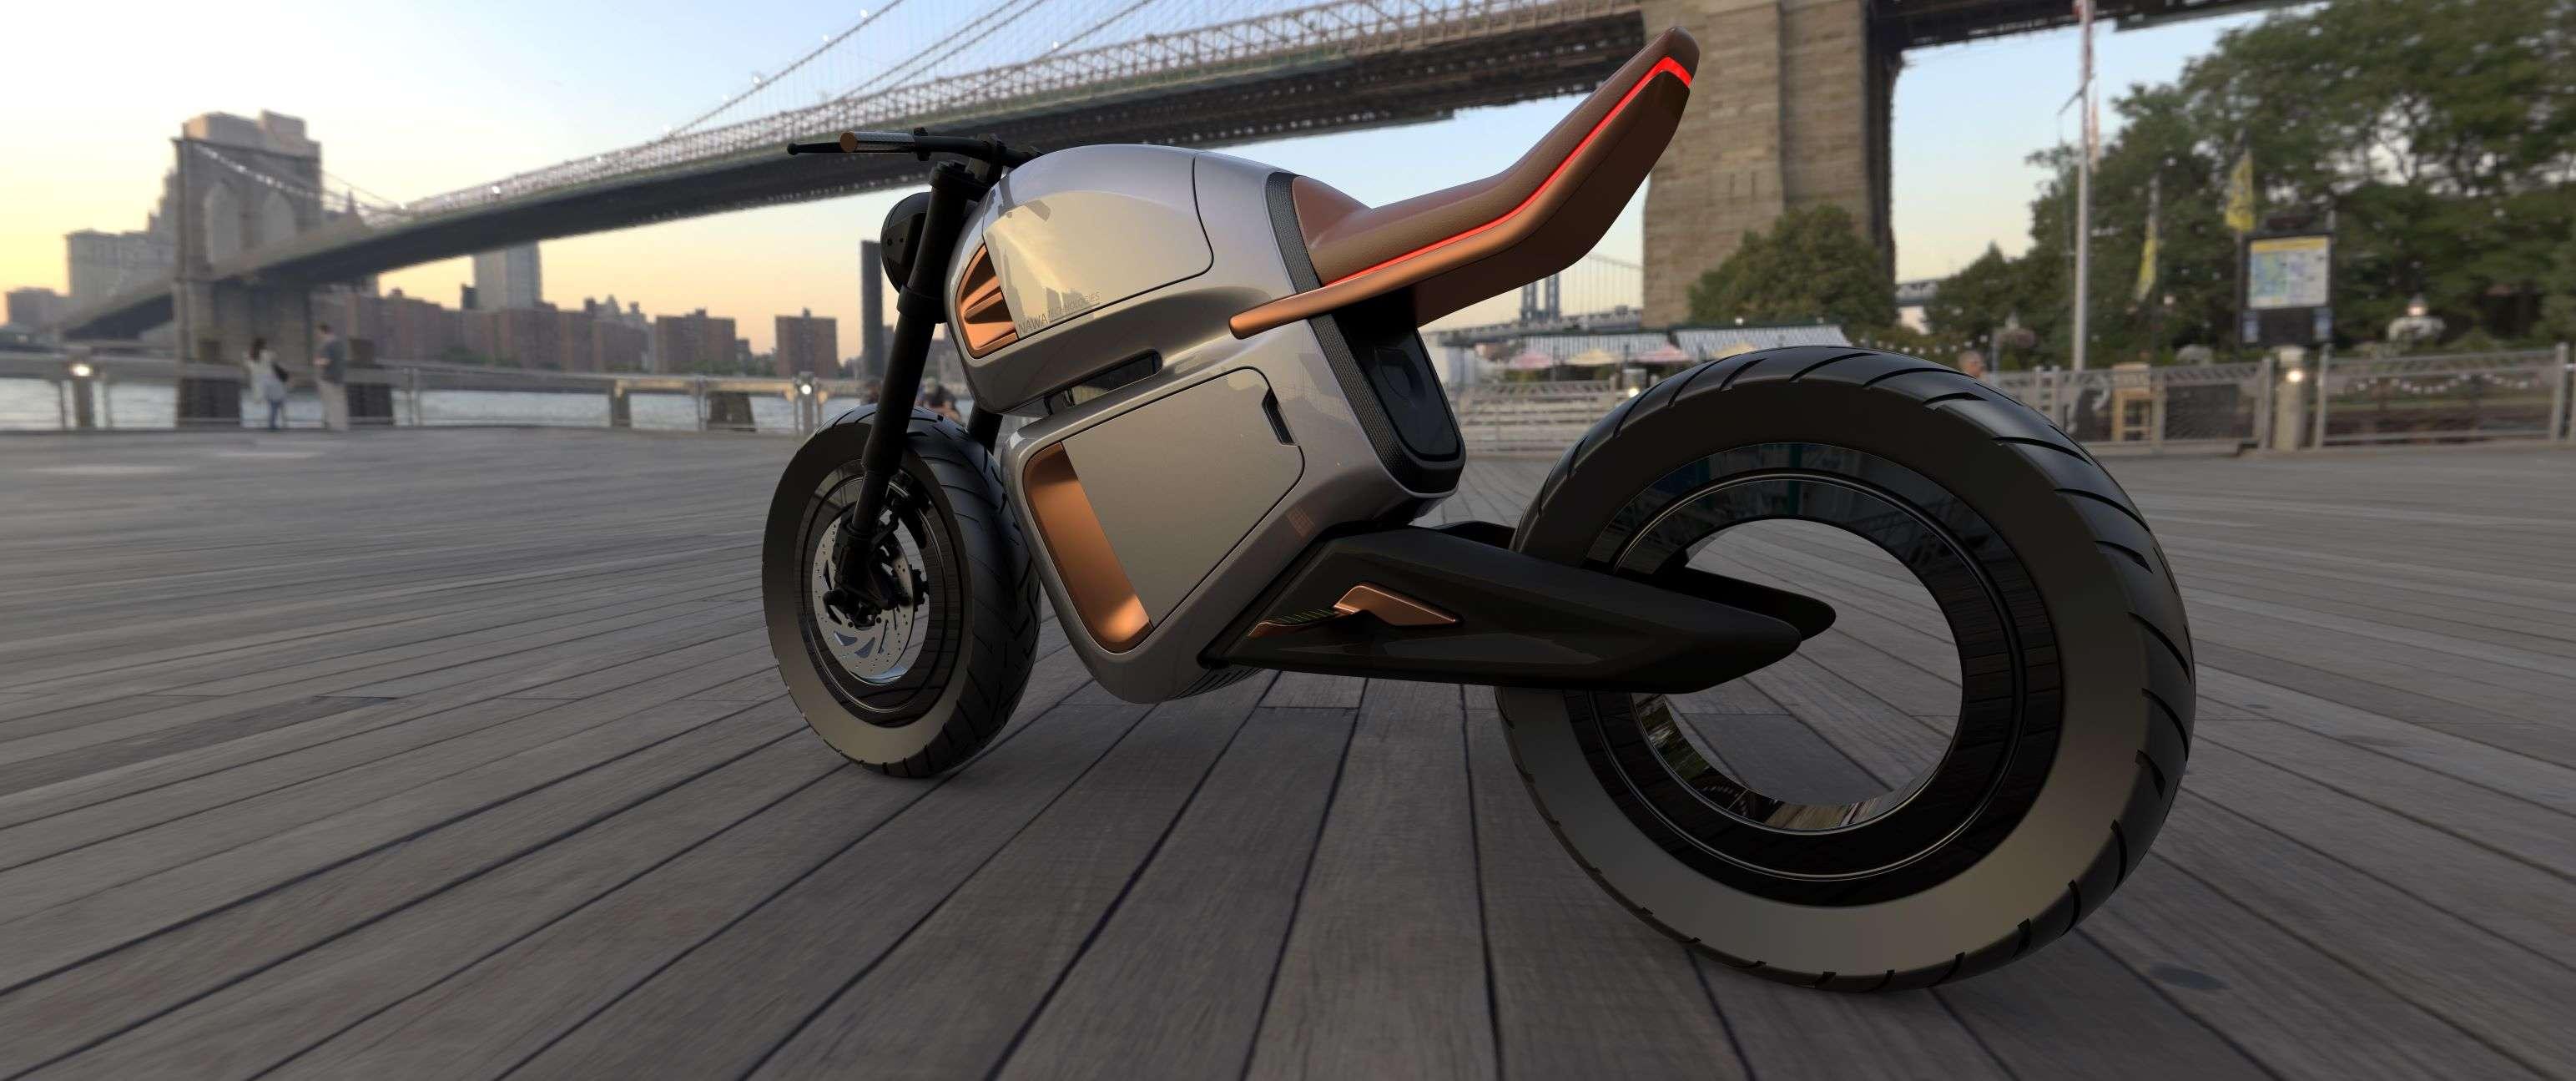 Electric Bike Concept Nawa Technologies Unveils New Electric Bike Concept At Ces 2020 Auto News Et Auto